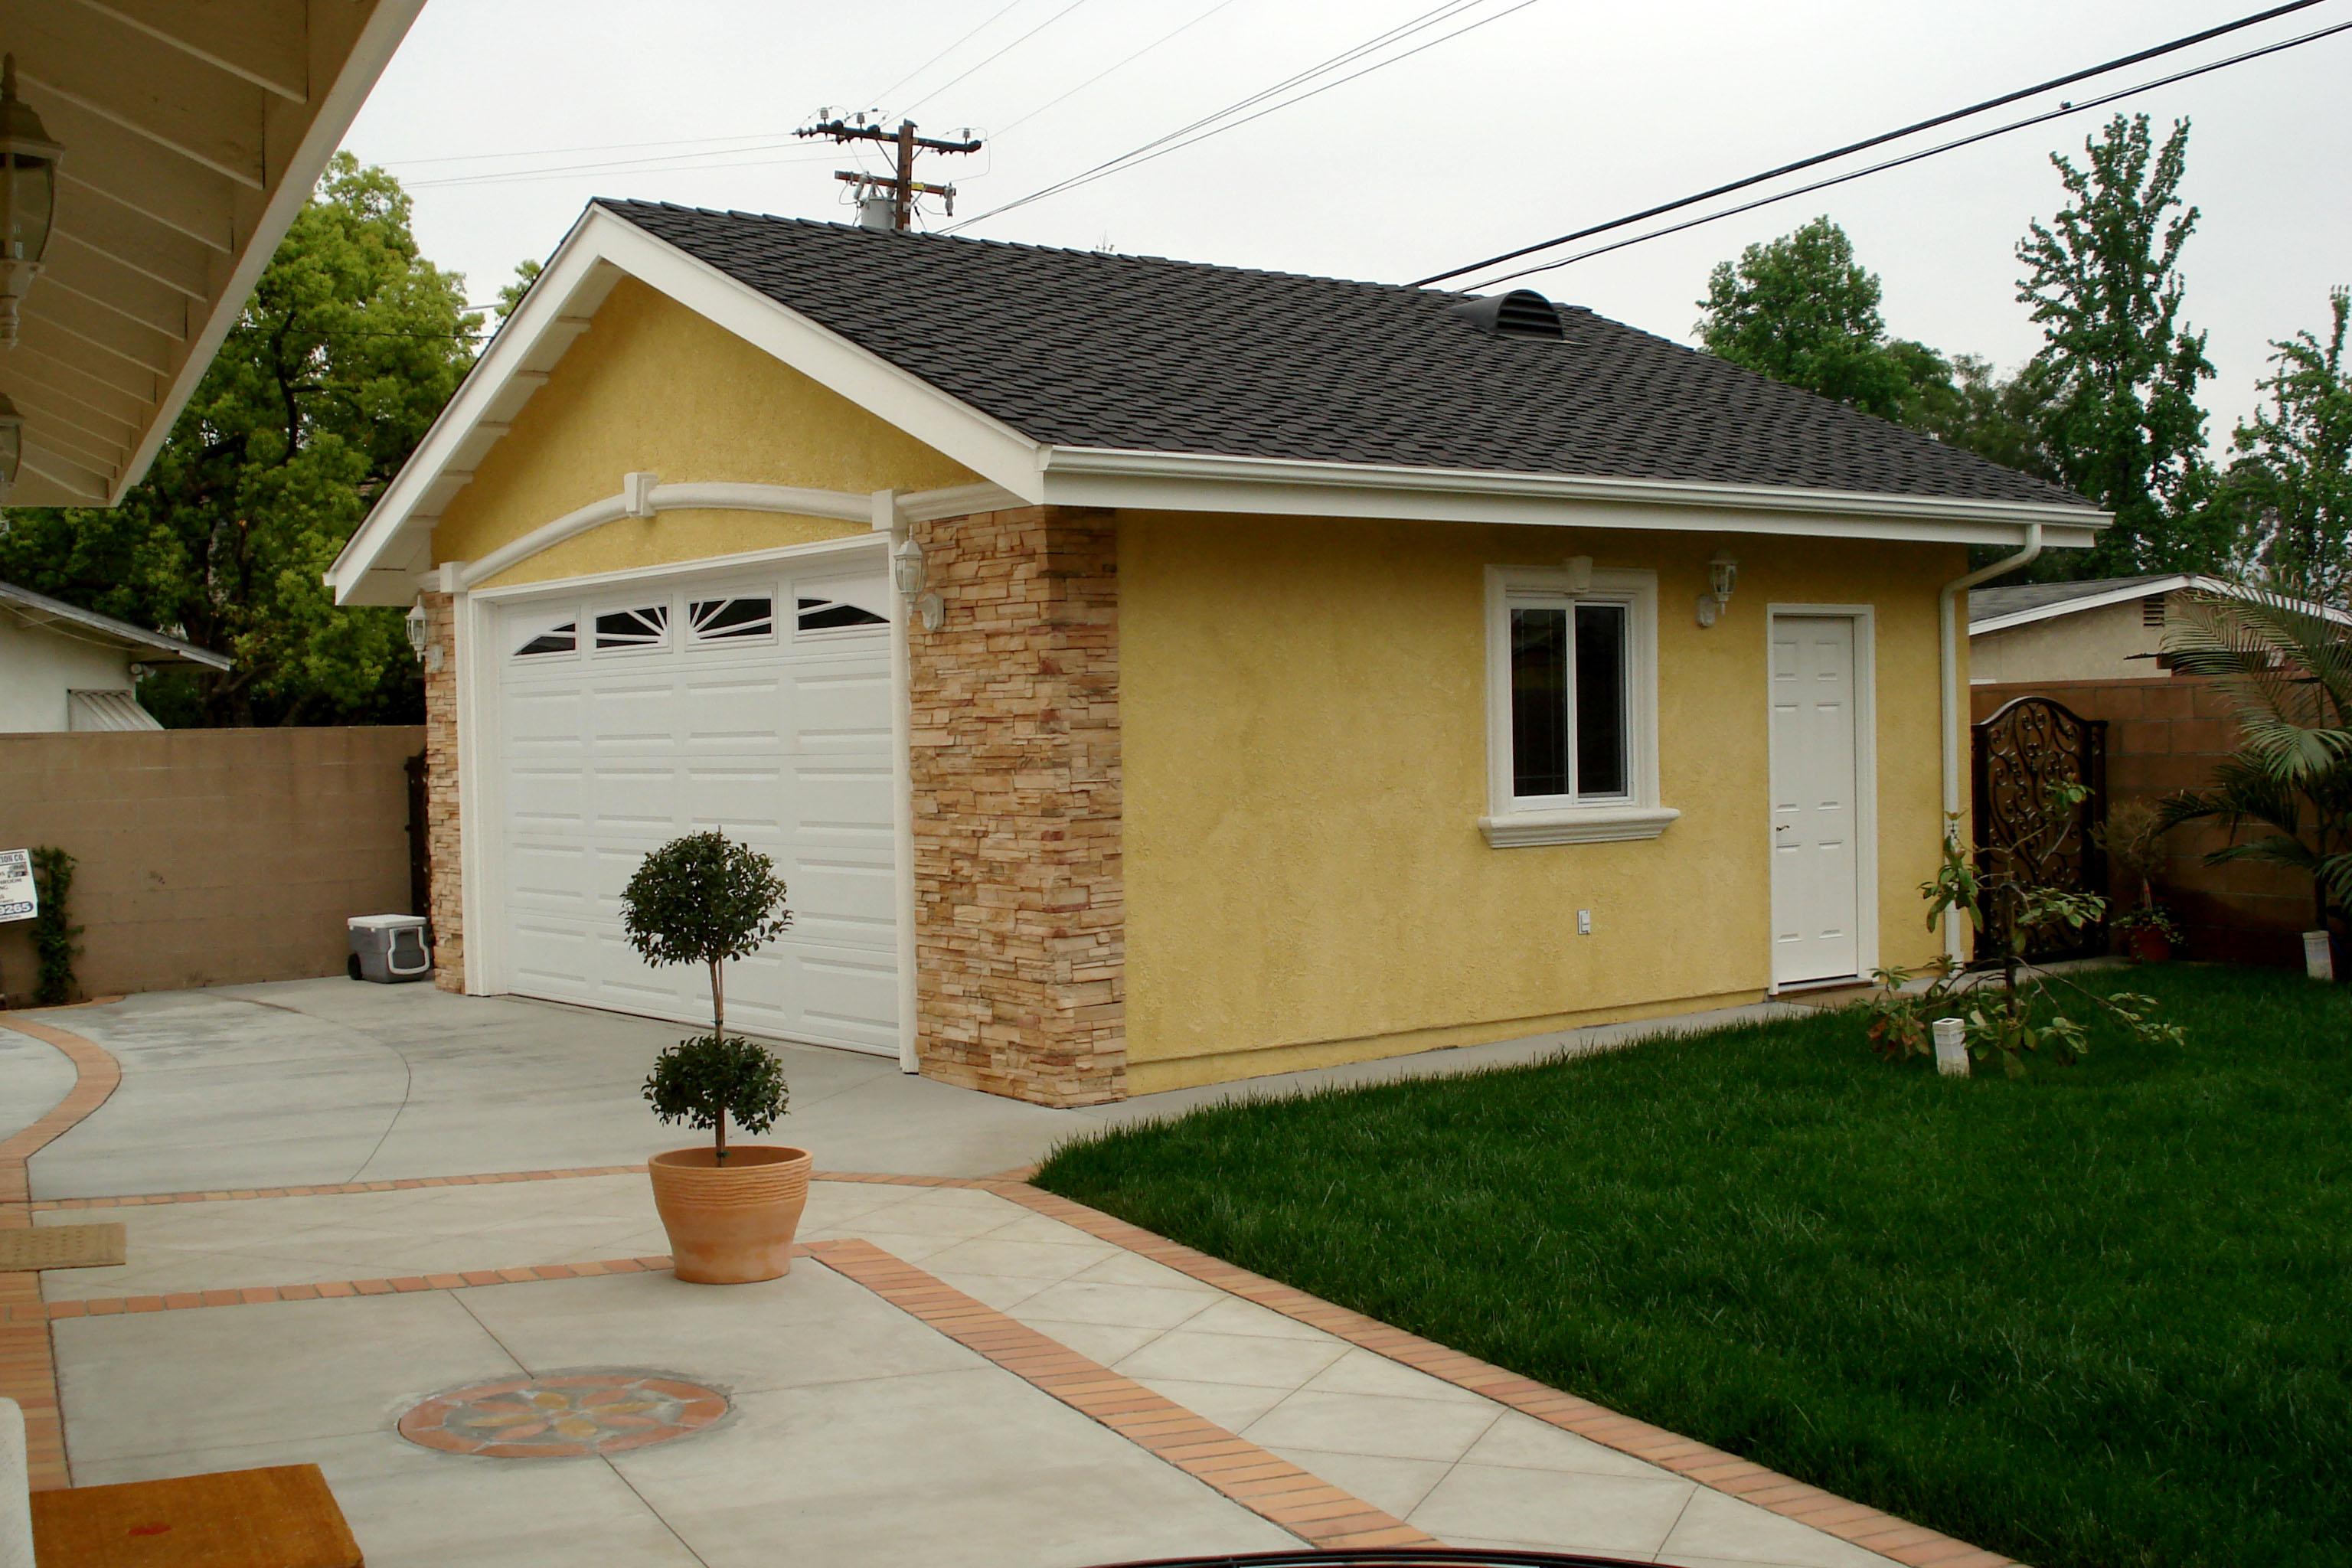 Room additions garages ortega construction co la for Garage extension cost estimate